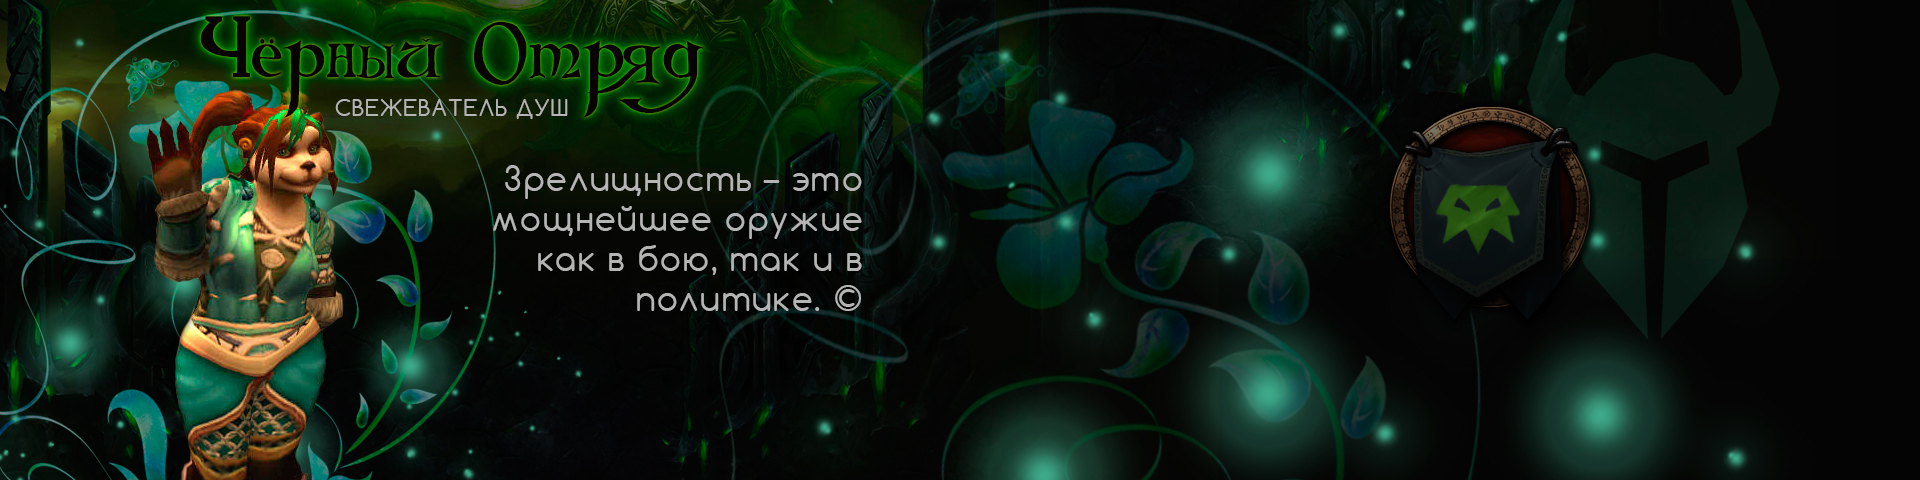 http://se.uploads.ru/kuD73.jpg